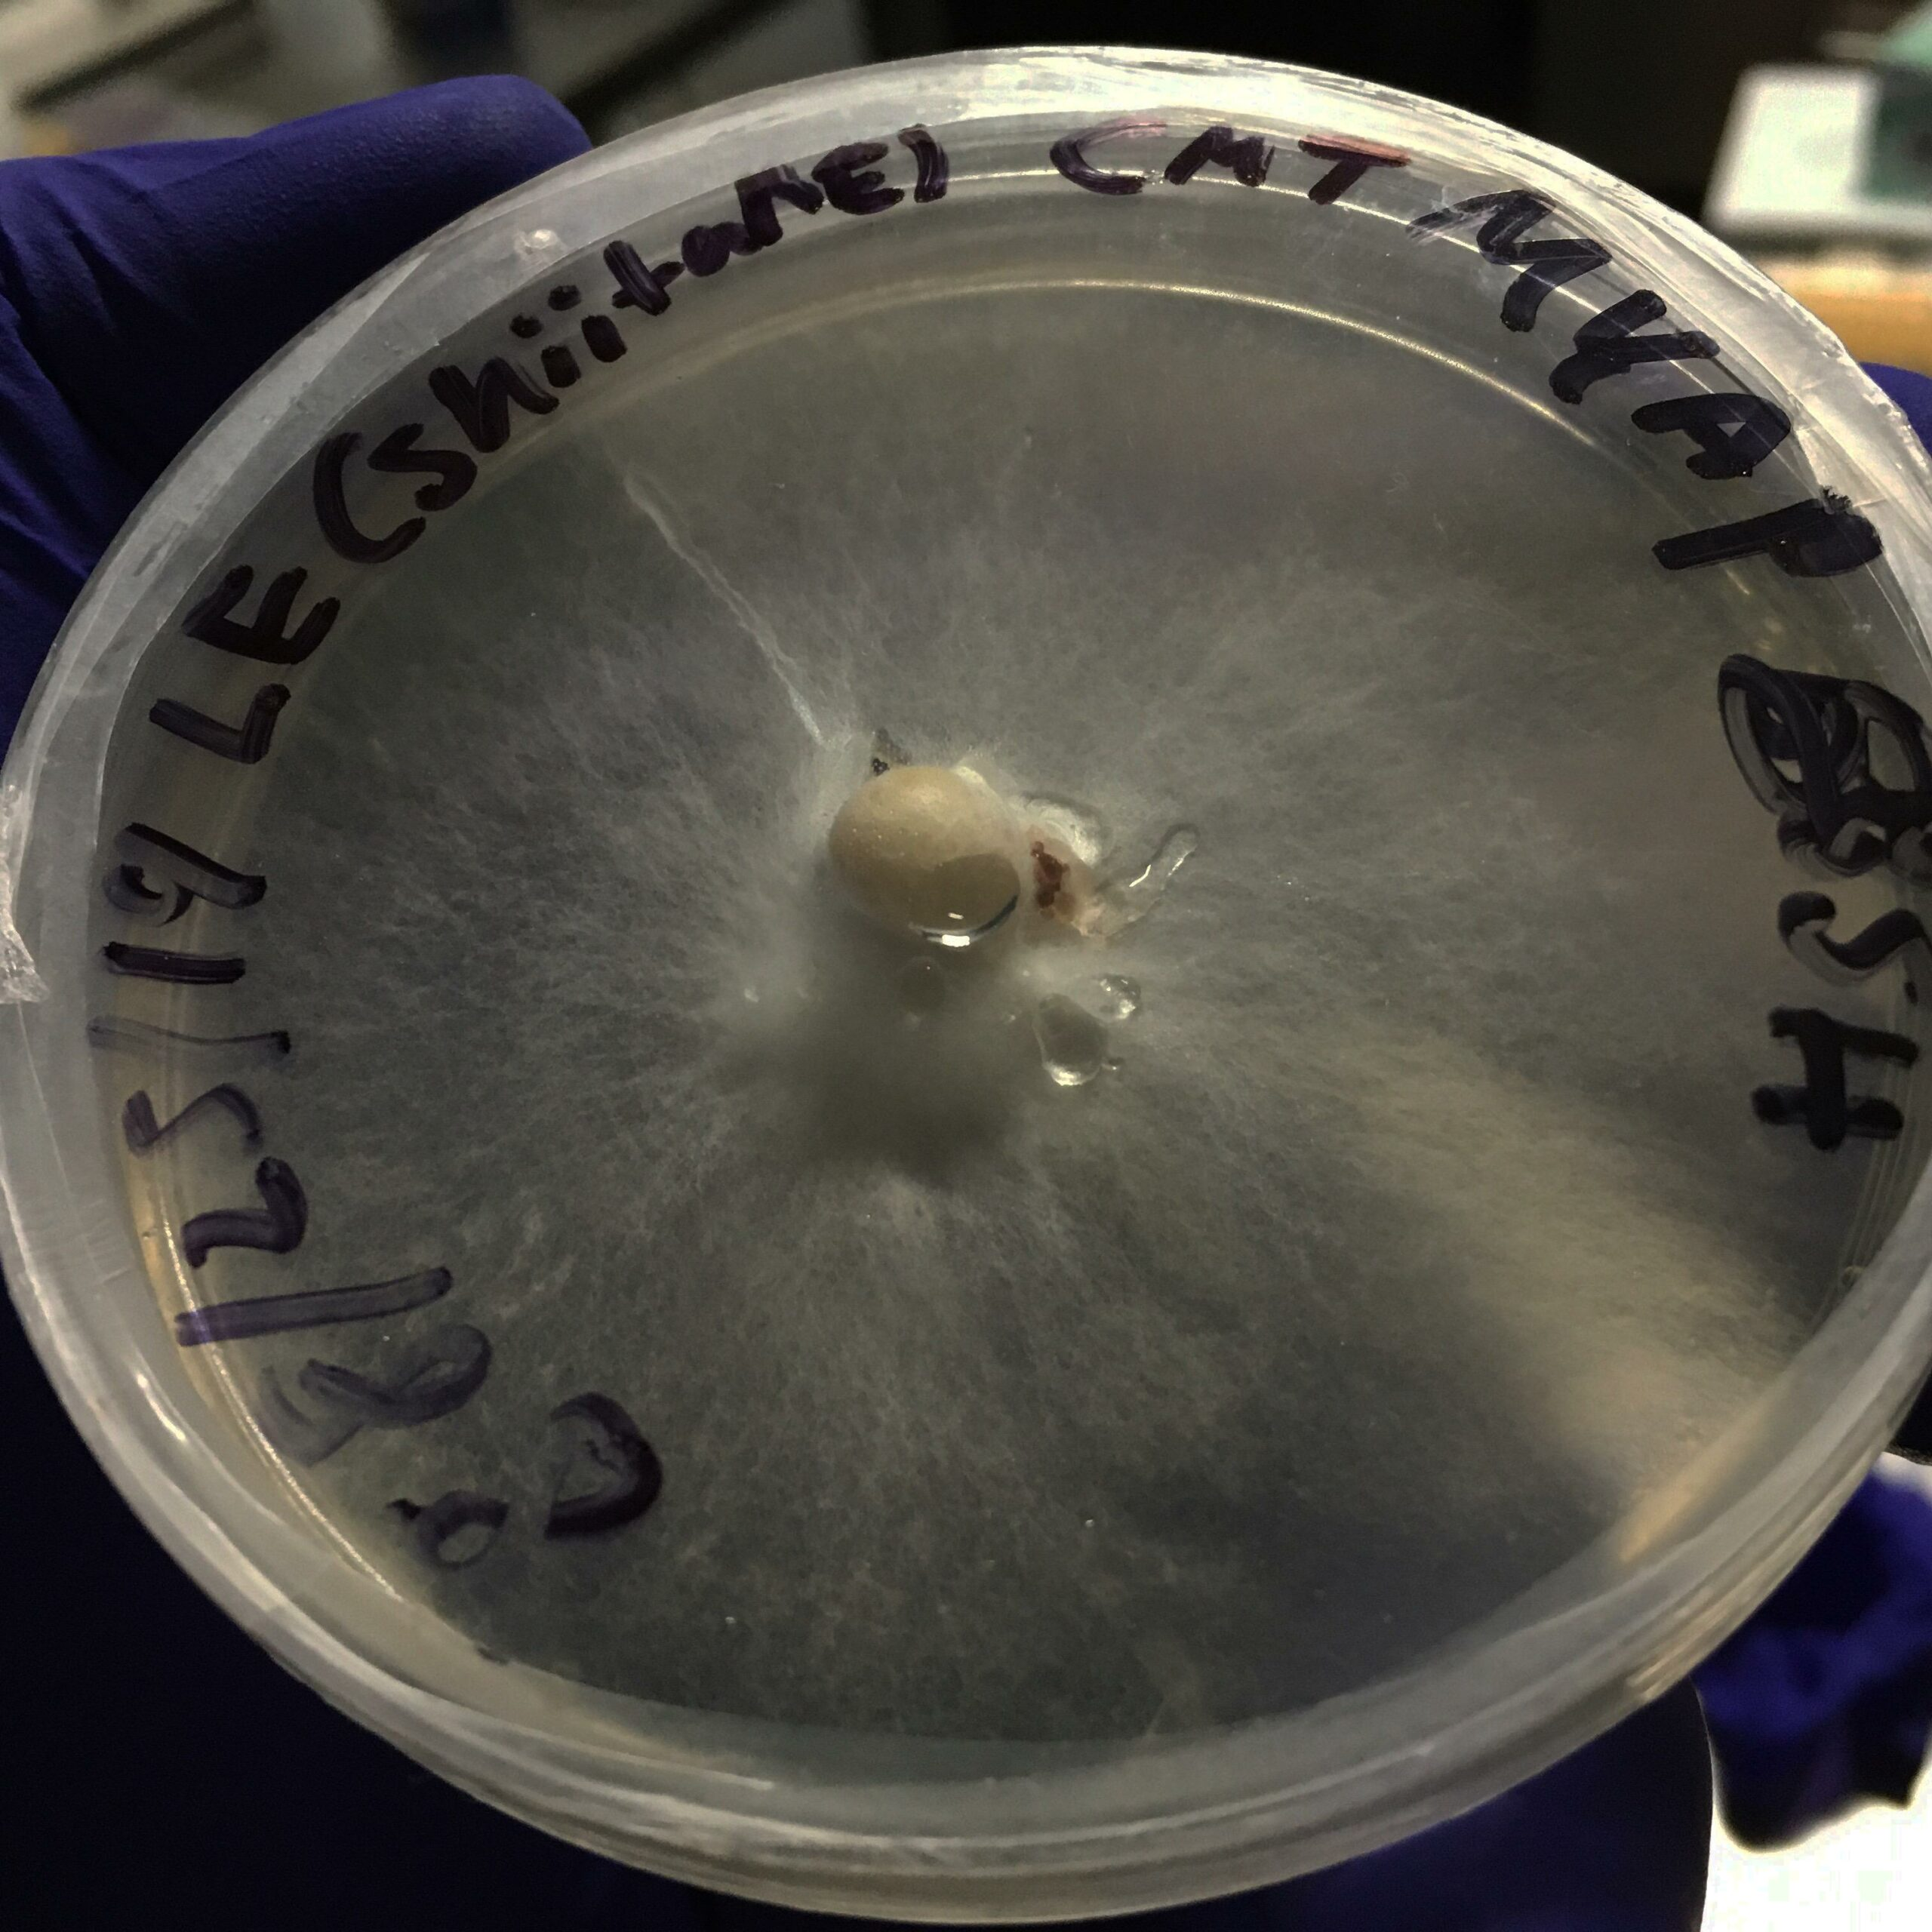 How To Run Mycelium: A Fungal Tissue Culture Workshop